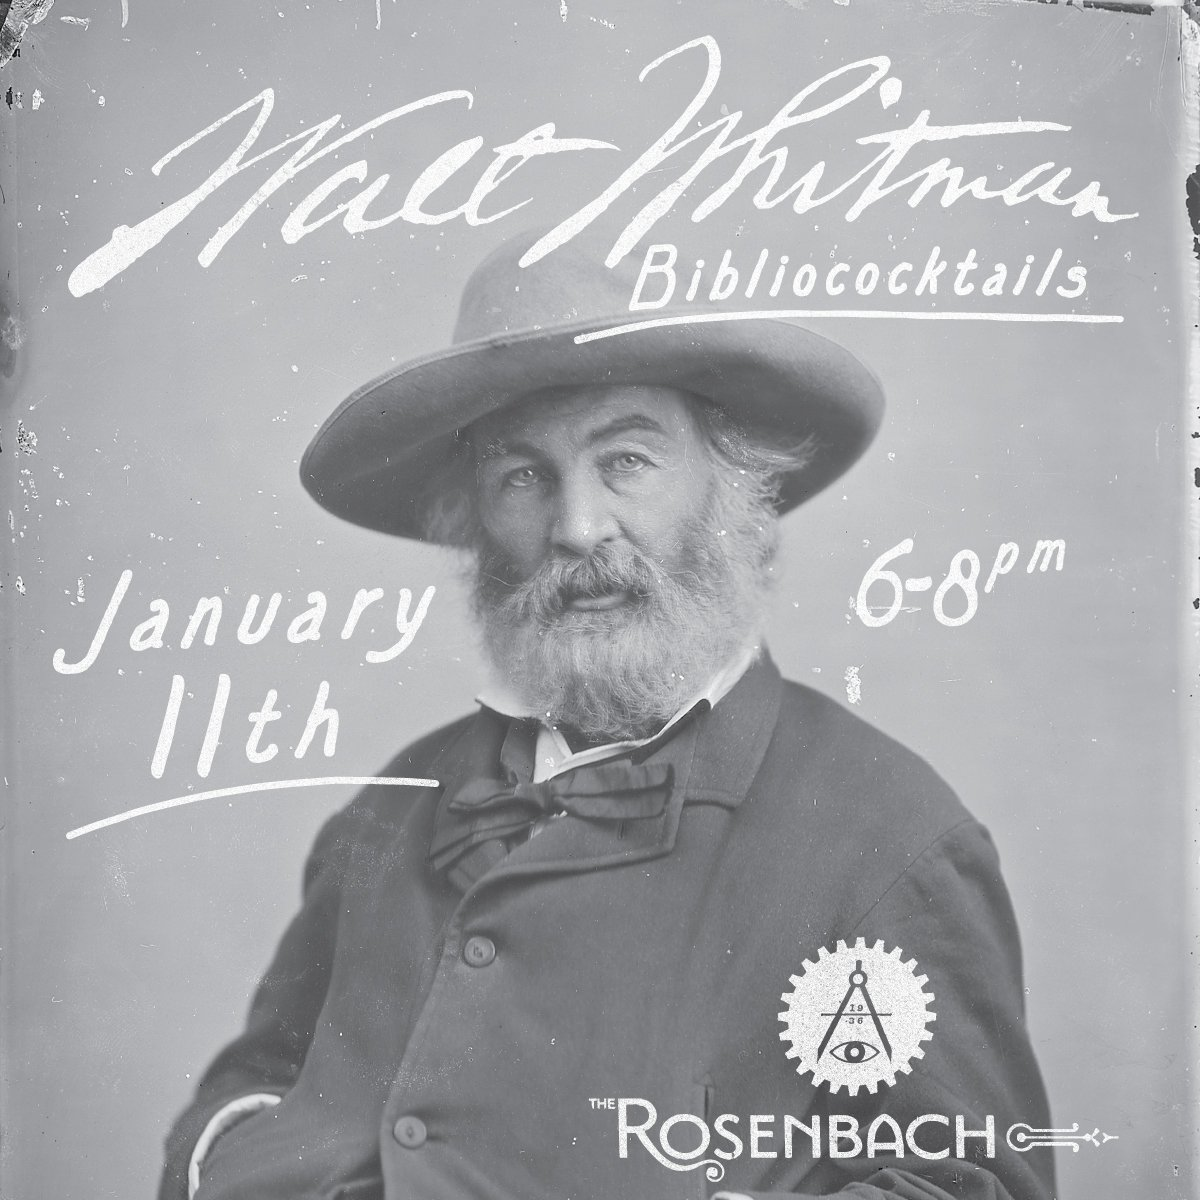 Bibliococktails: Walt Whitman